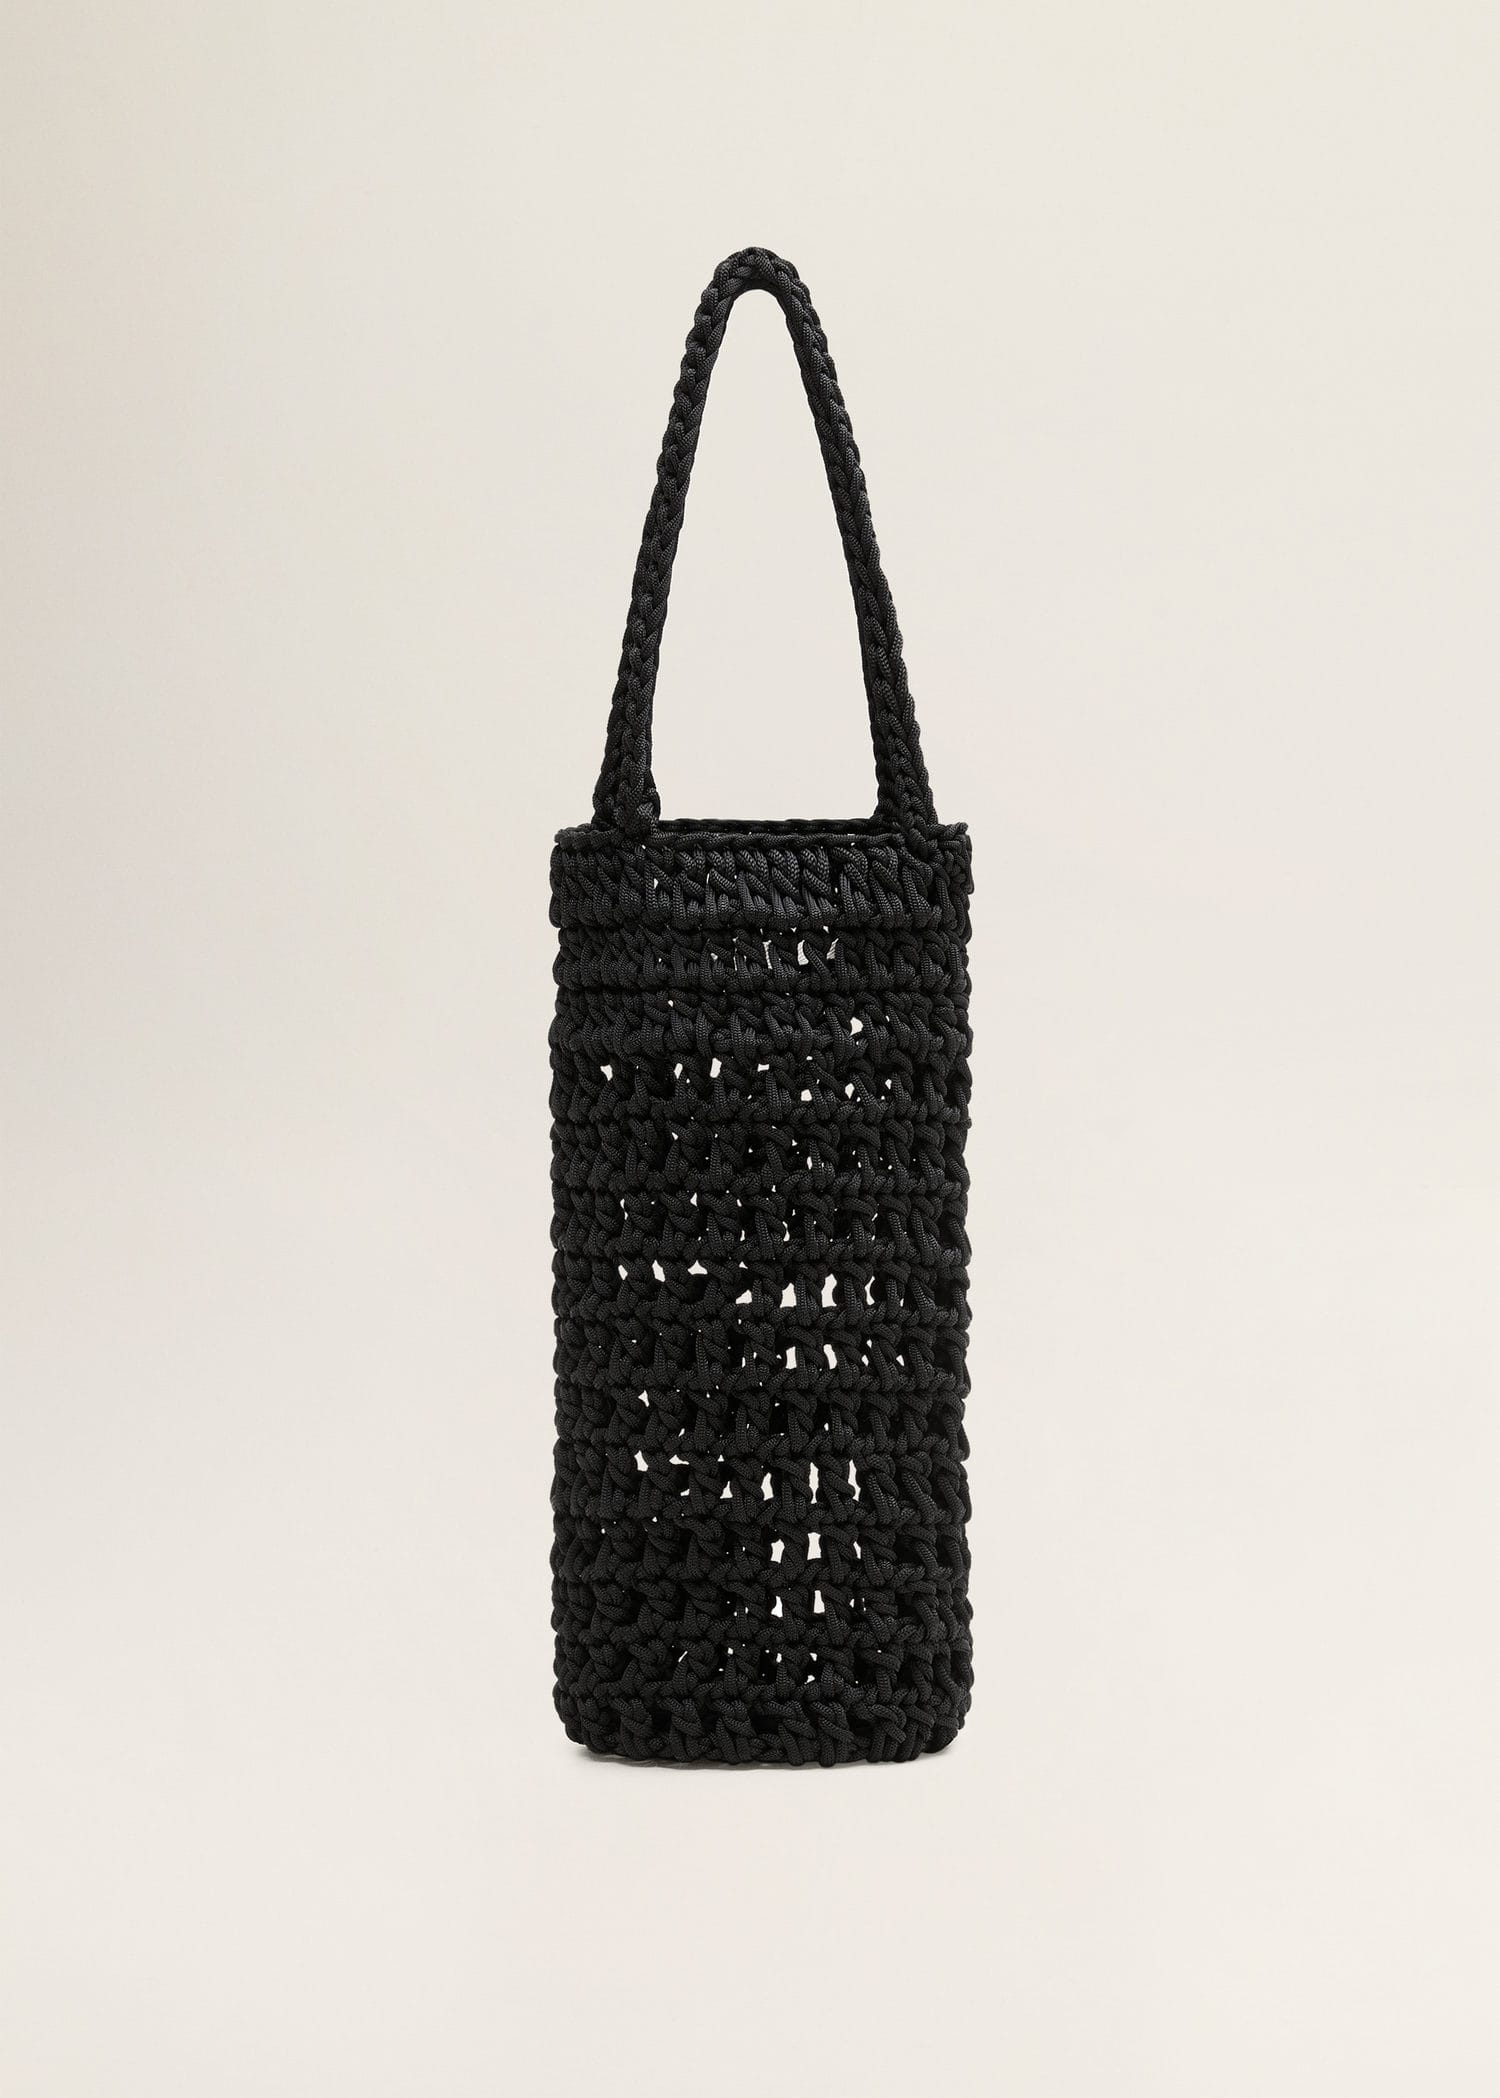 Sac Crochet Fait Main Femme Mango France